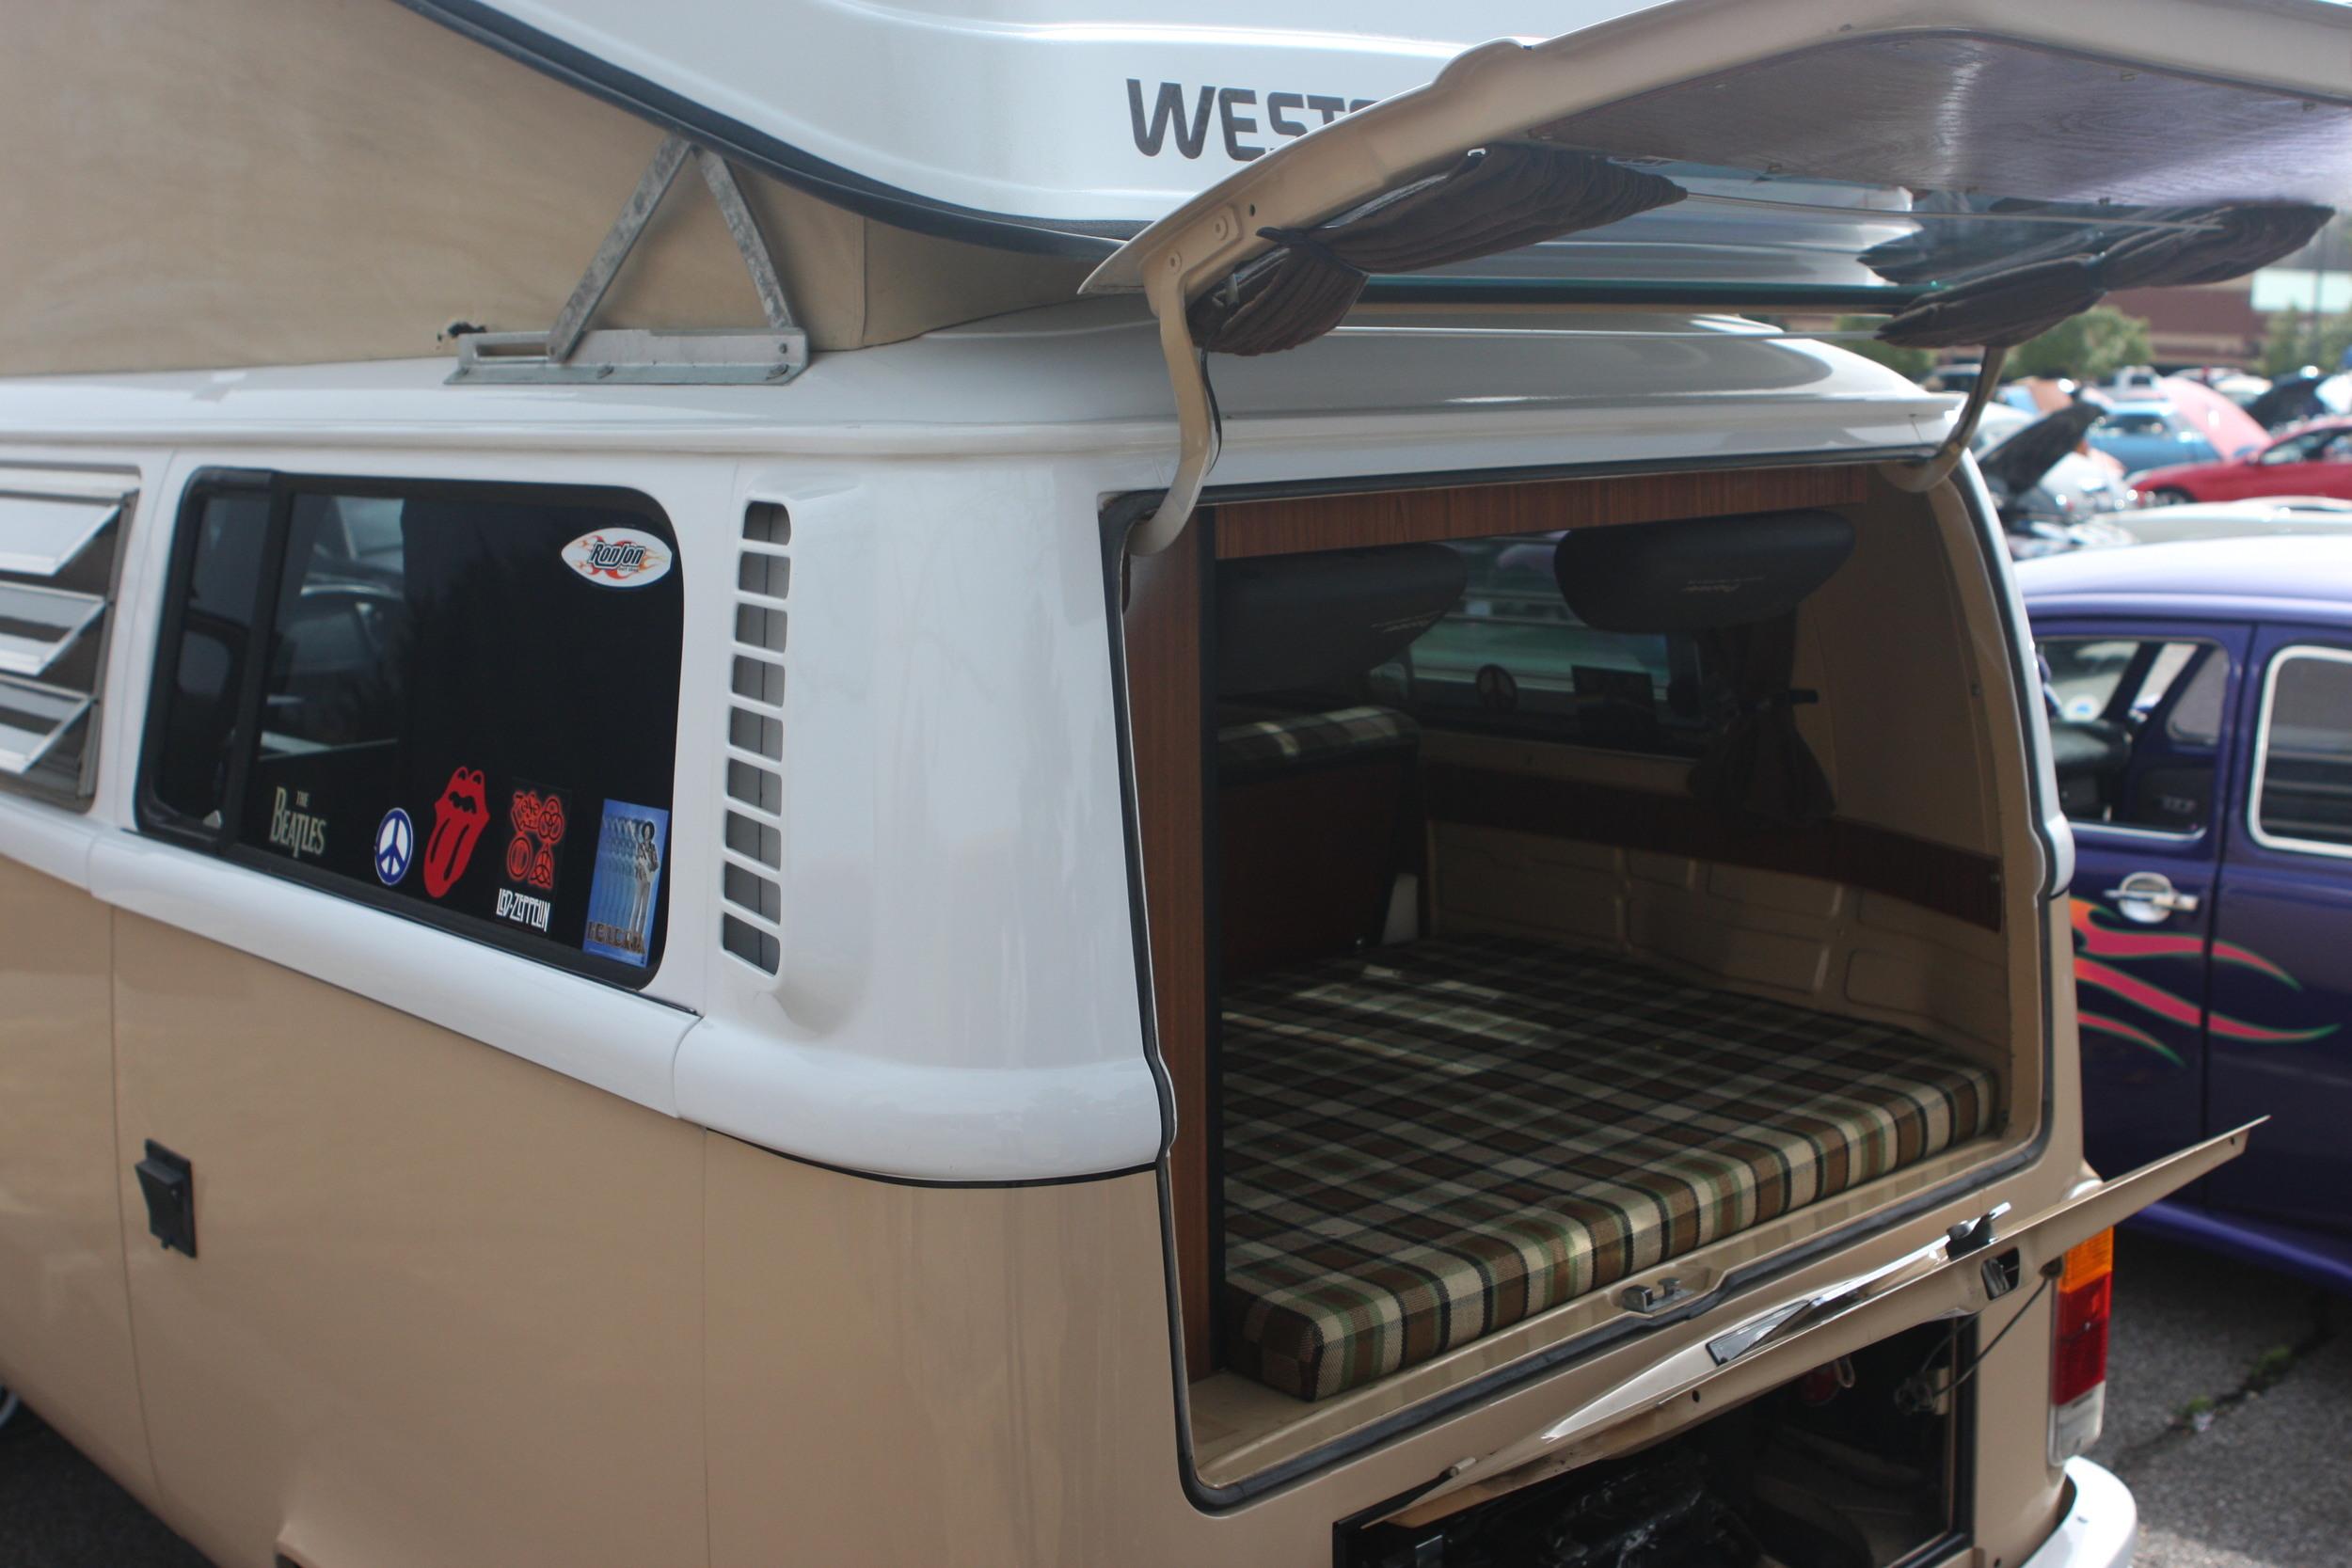 VWWestfalia9